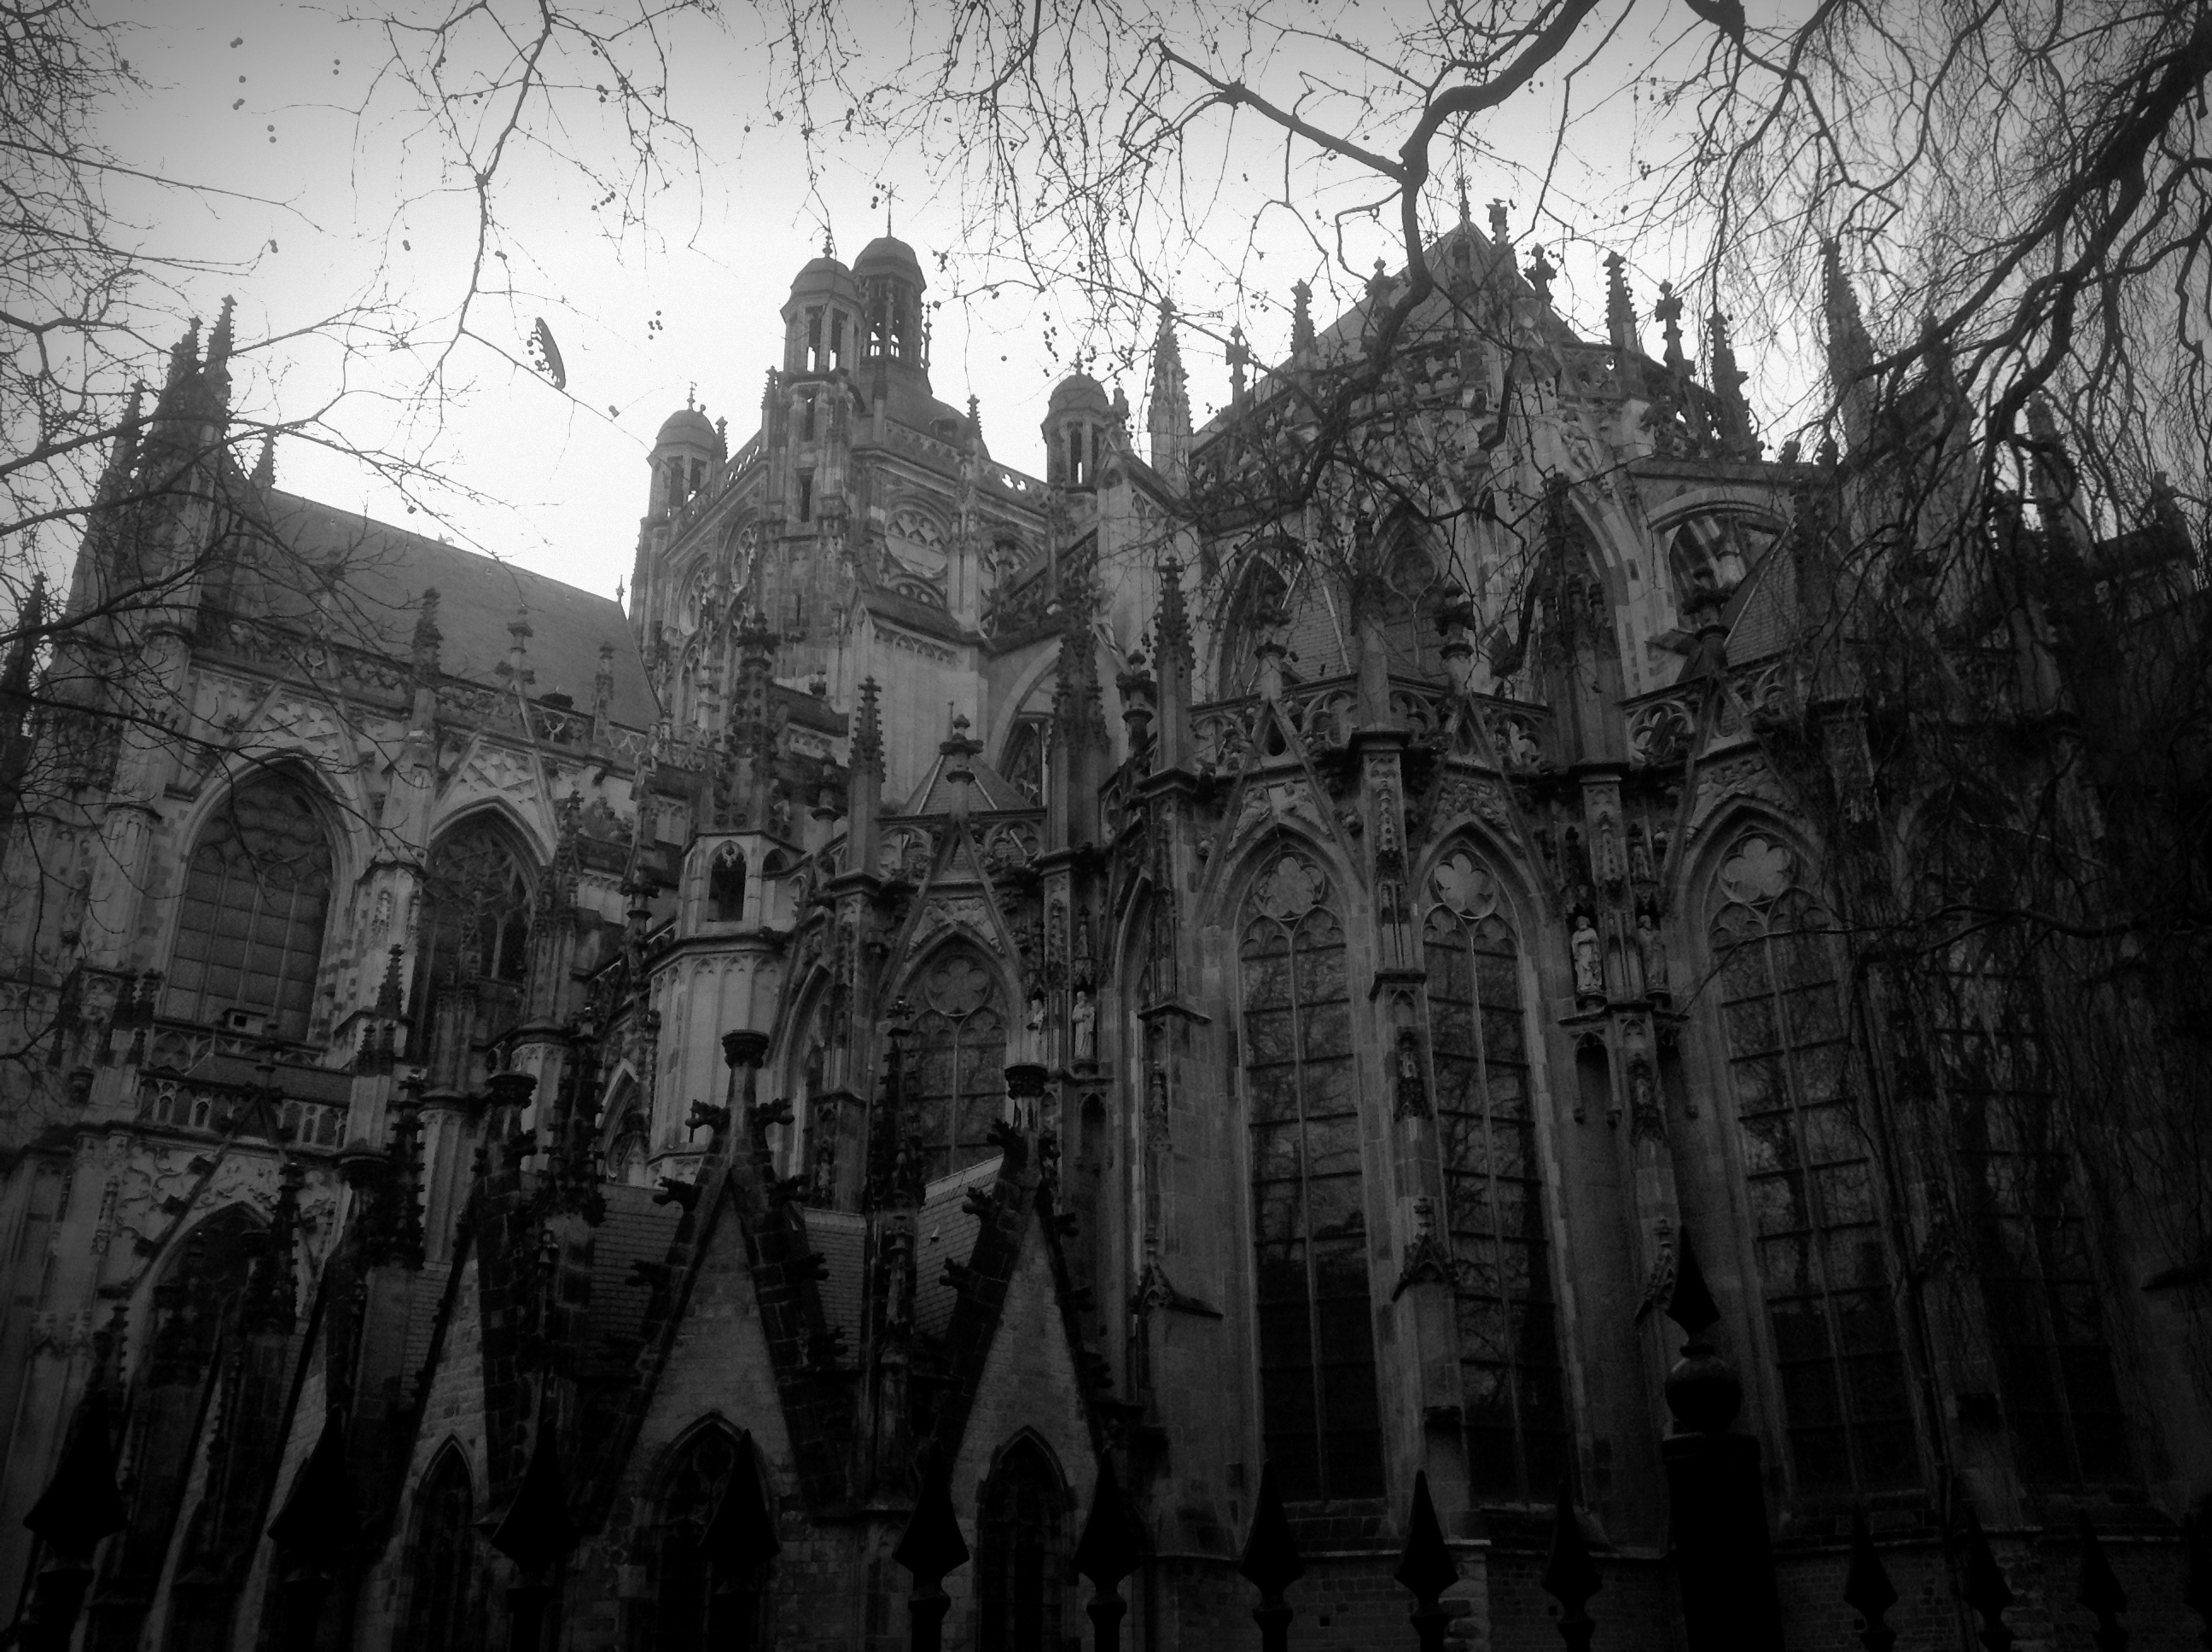 St.-Johannes-Kathedrale ('s-Hertogenbosch) (Foto: Theresa Arlt)